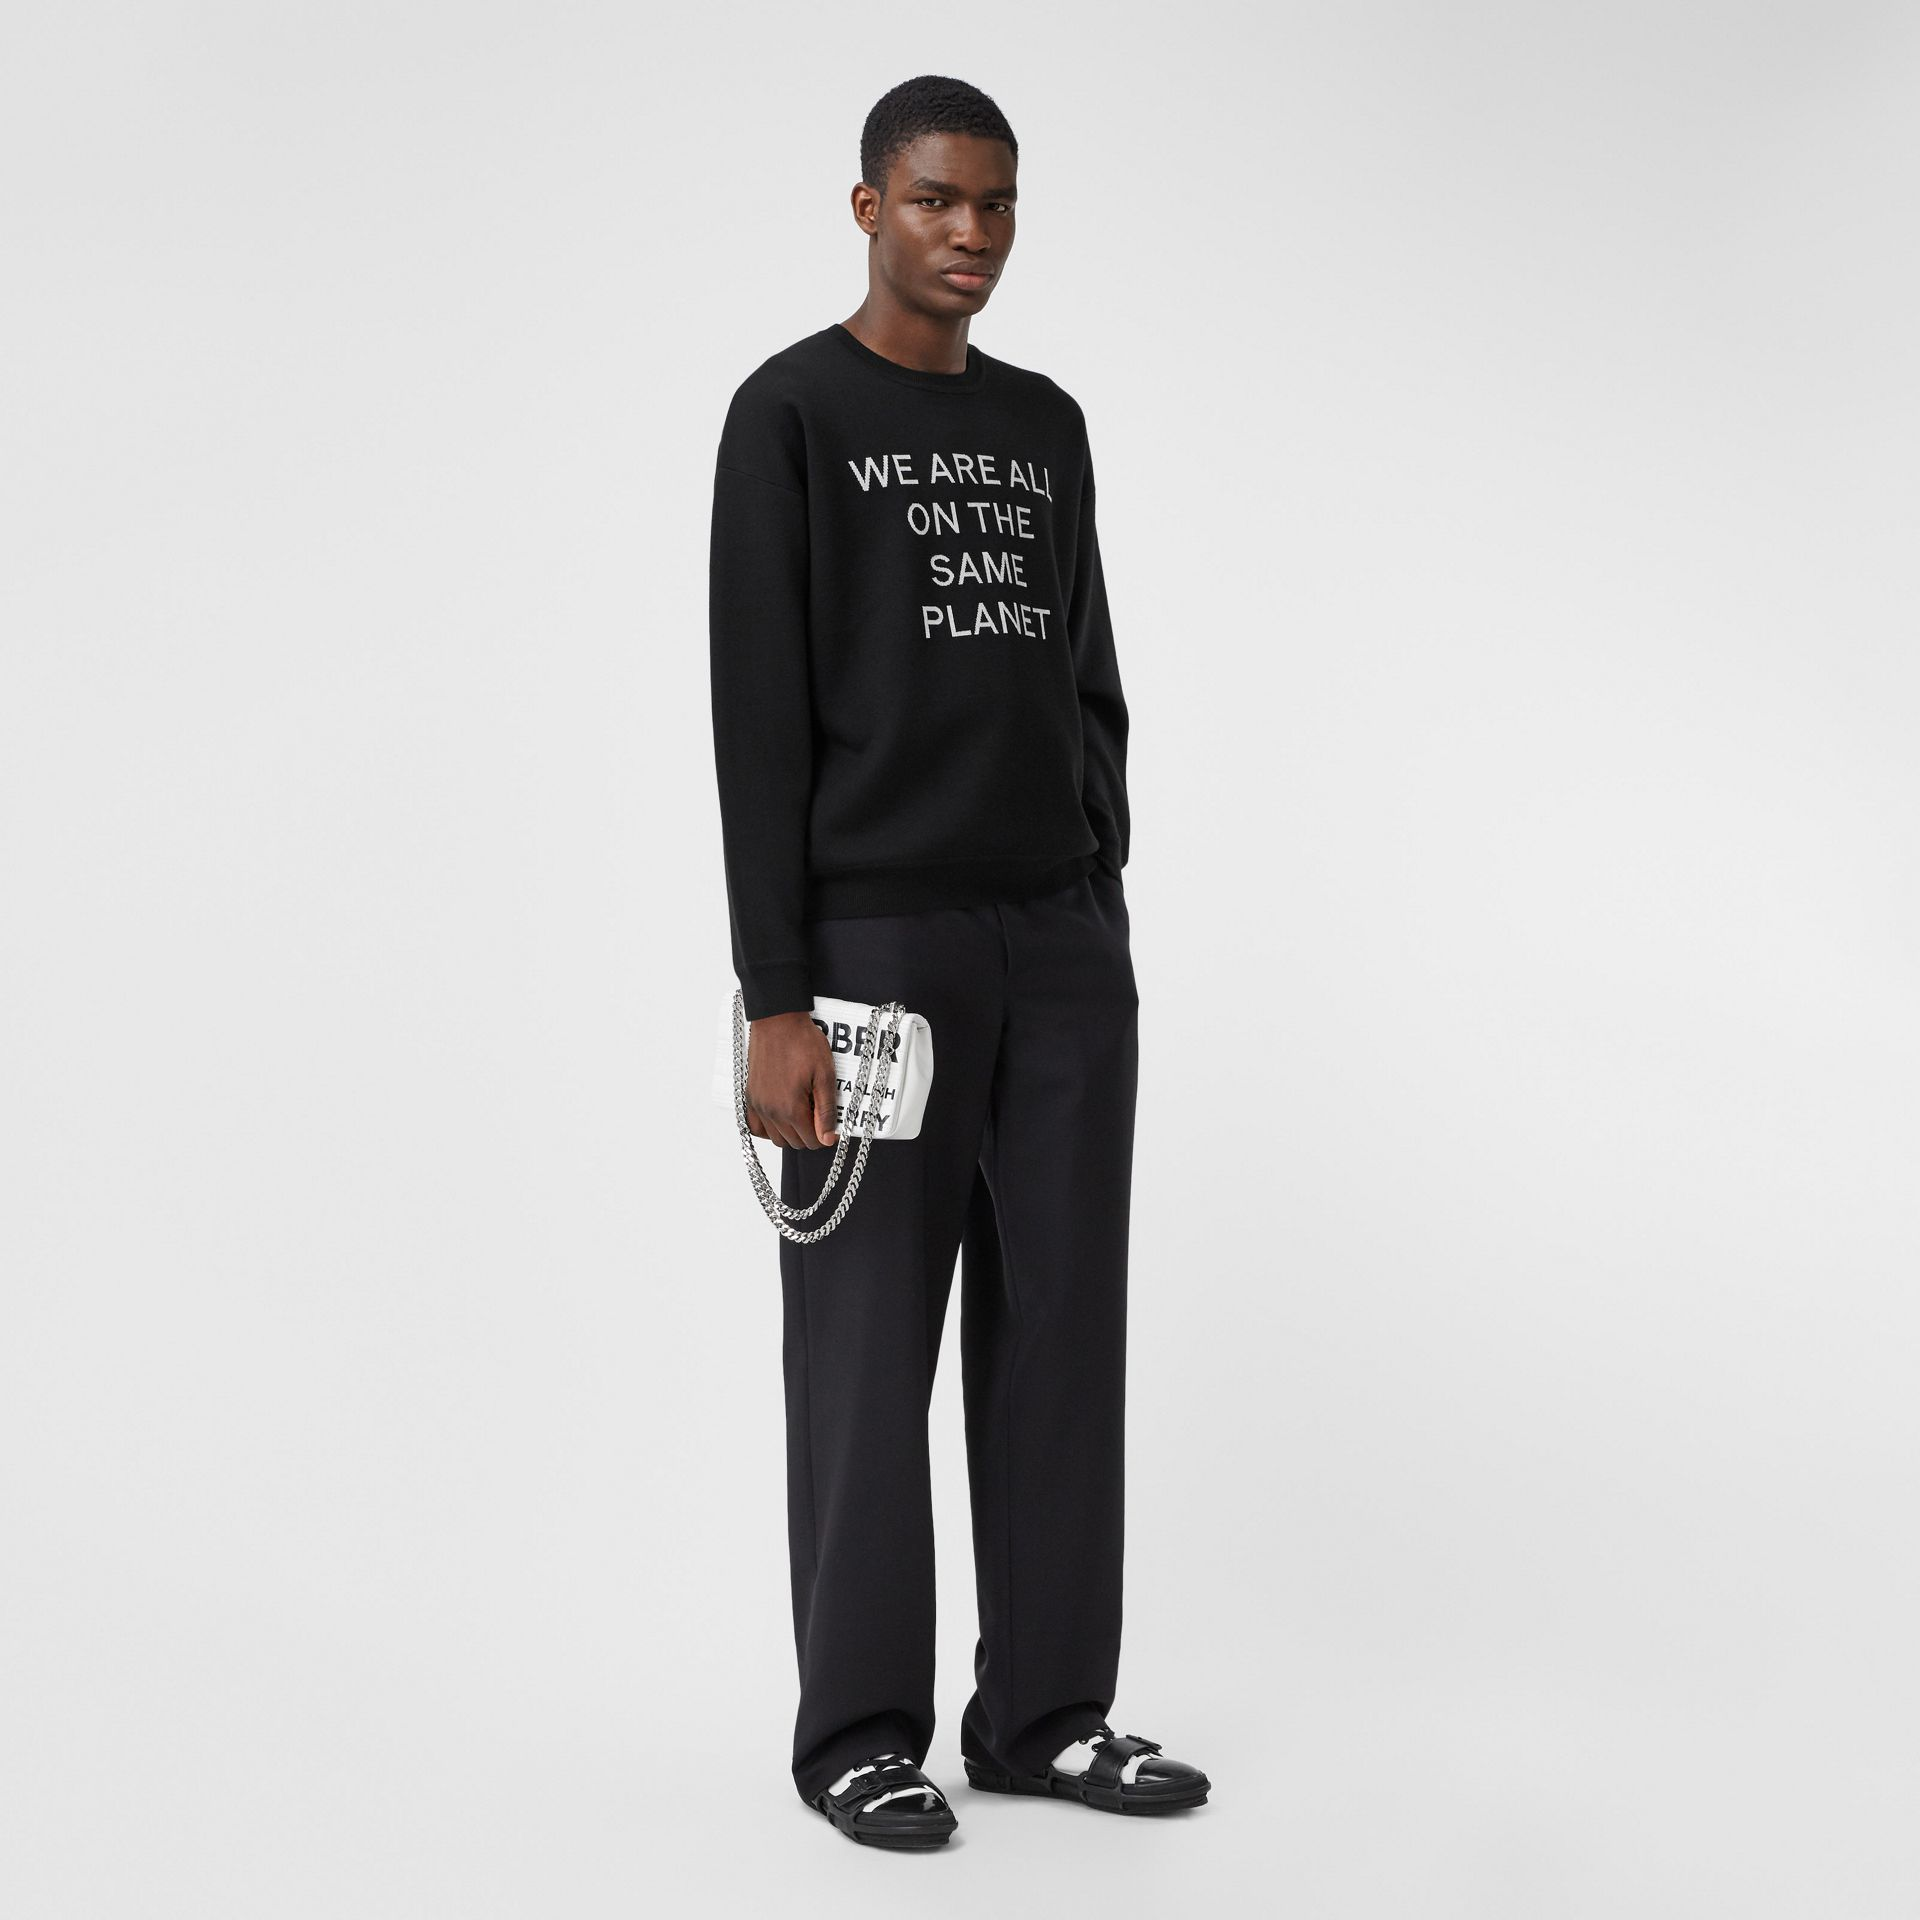 Slogan Intarsia Merino Wool Blend Sweater in Black - Men | Burberry Canada - gallery image 4